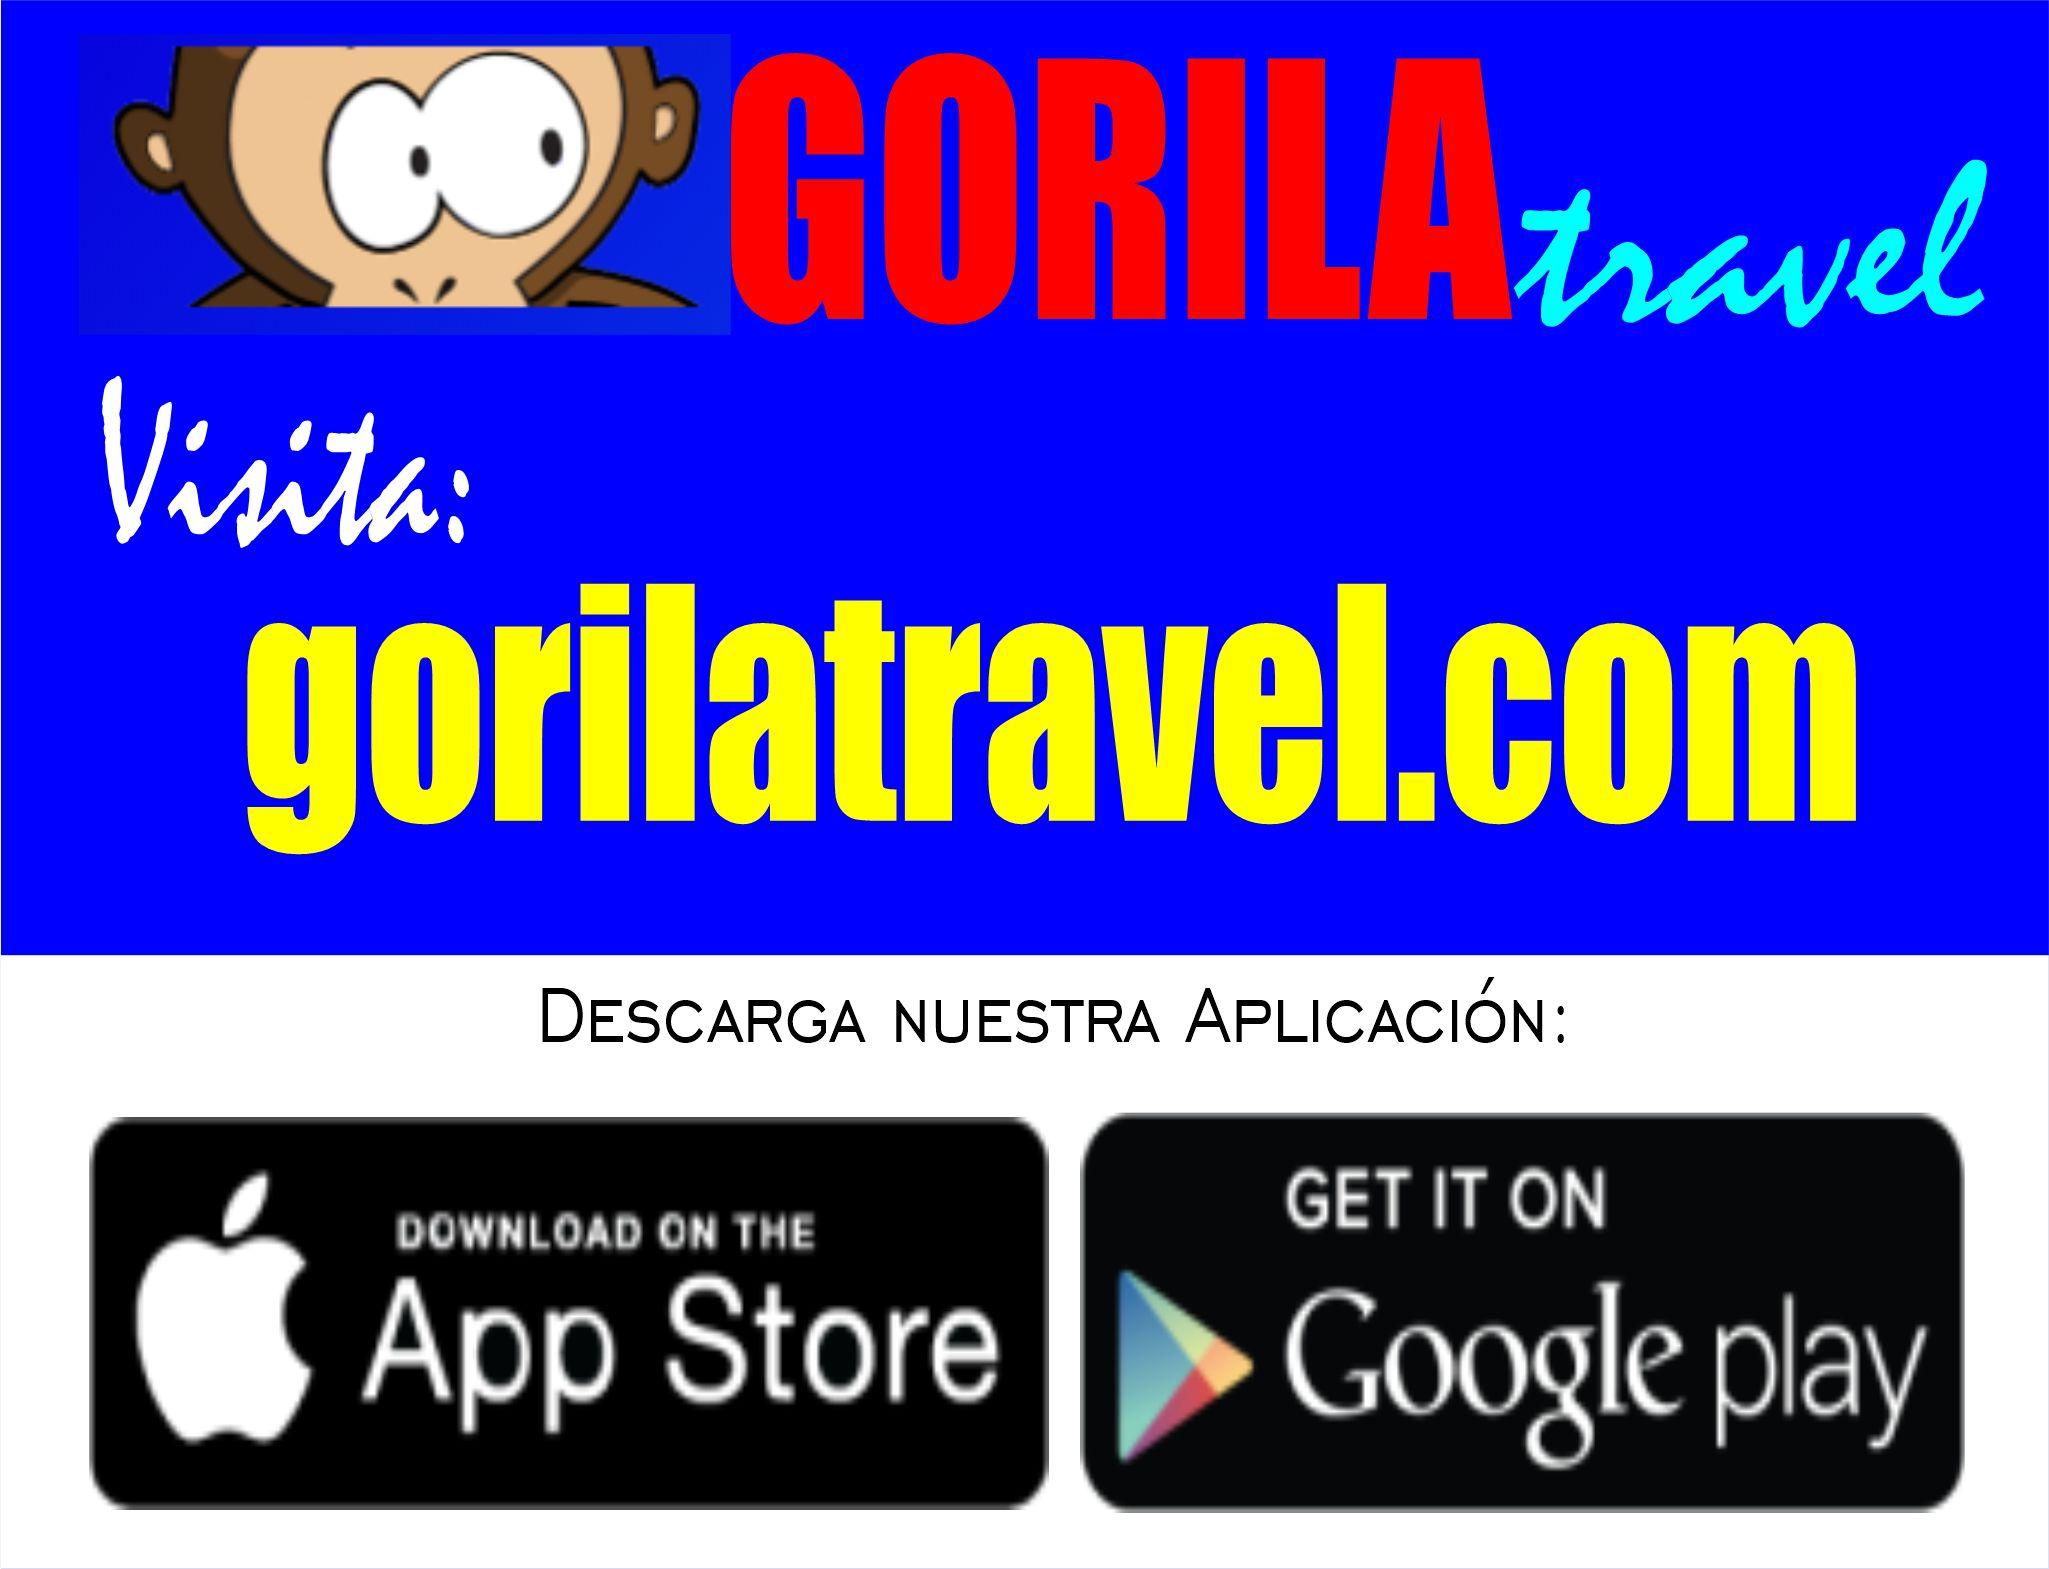 Gorila Travel Agency